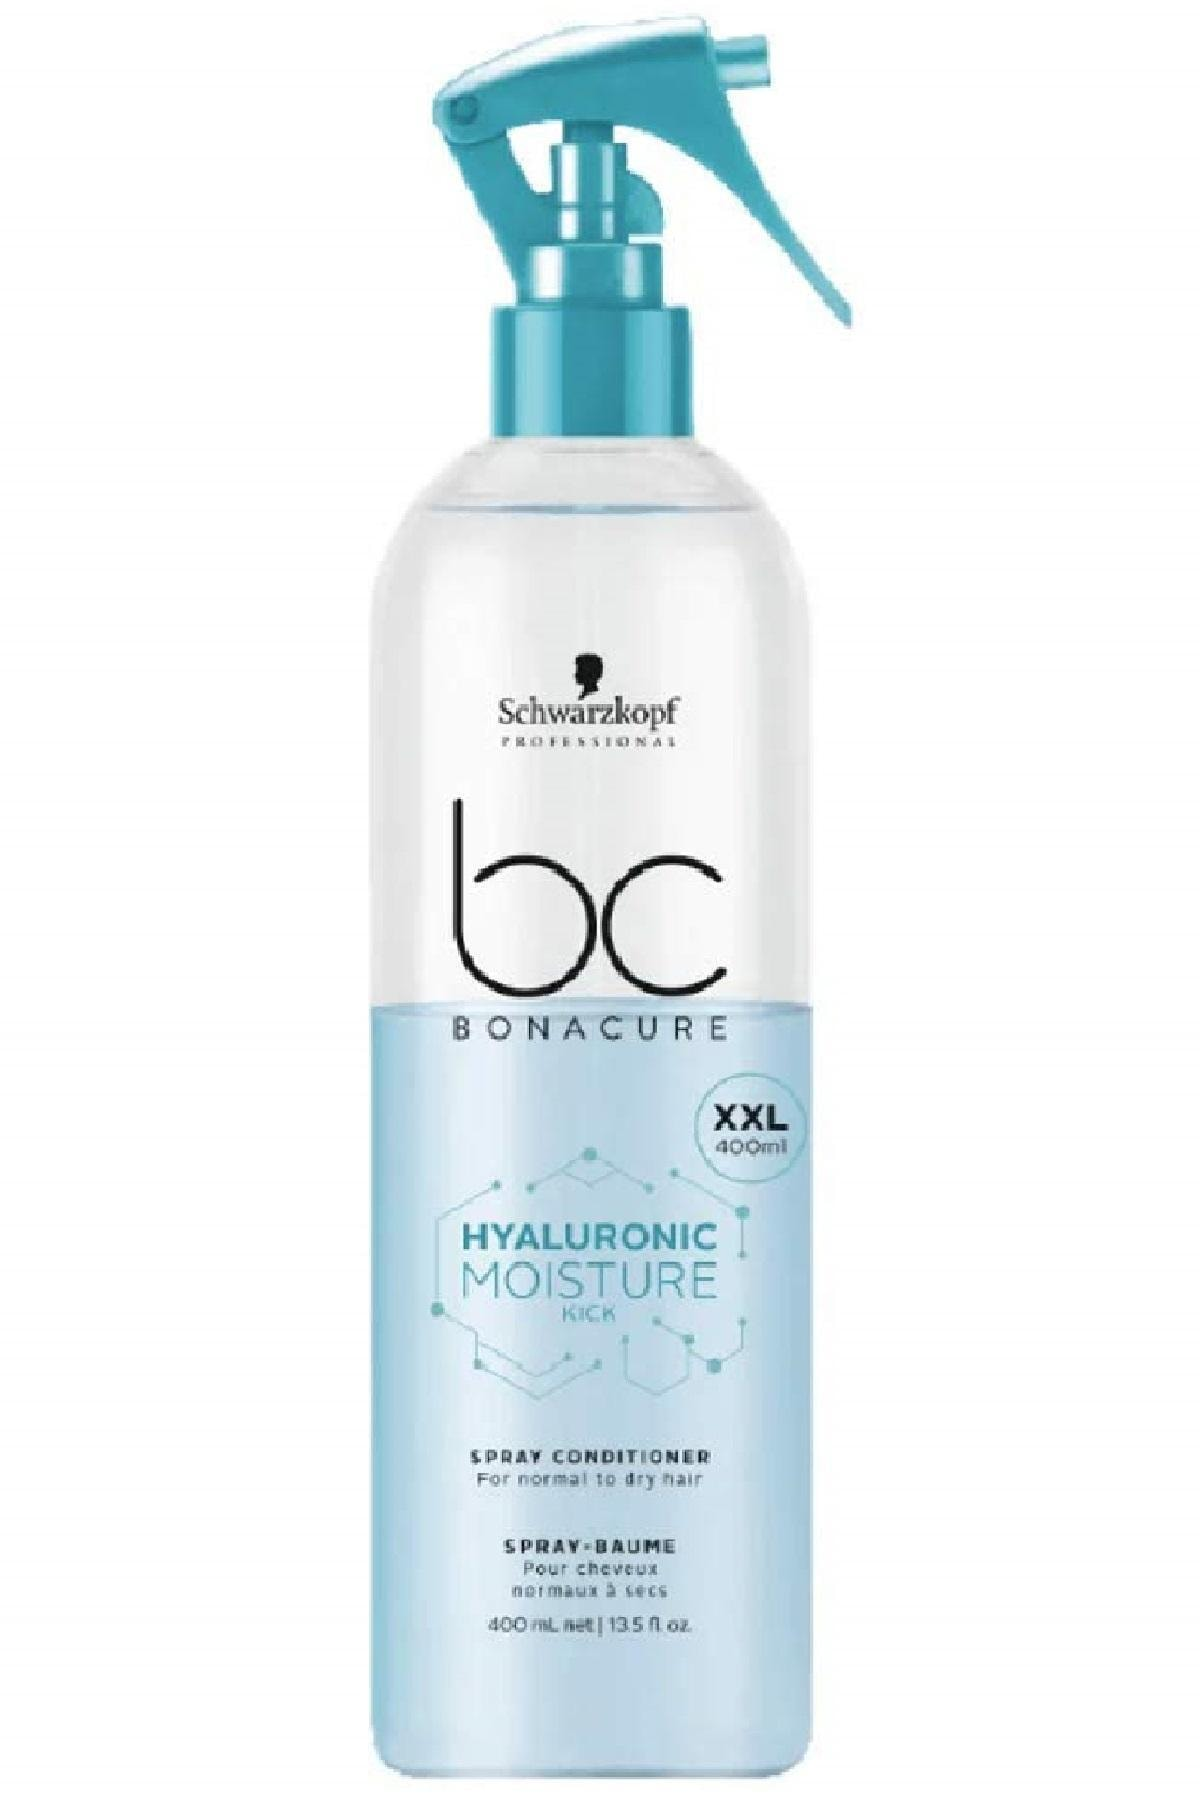 Bonacure Hyaluronic Moisture Kick Nem Yükleme Sprey Krem 400 ml 1